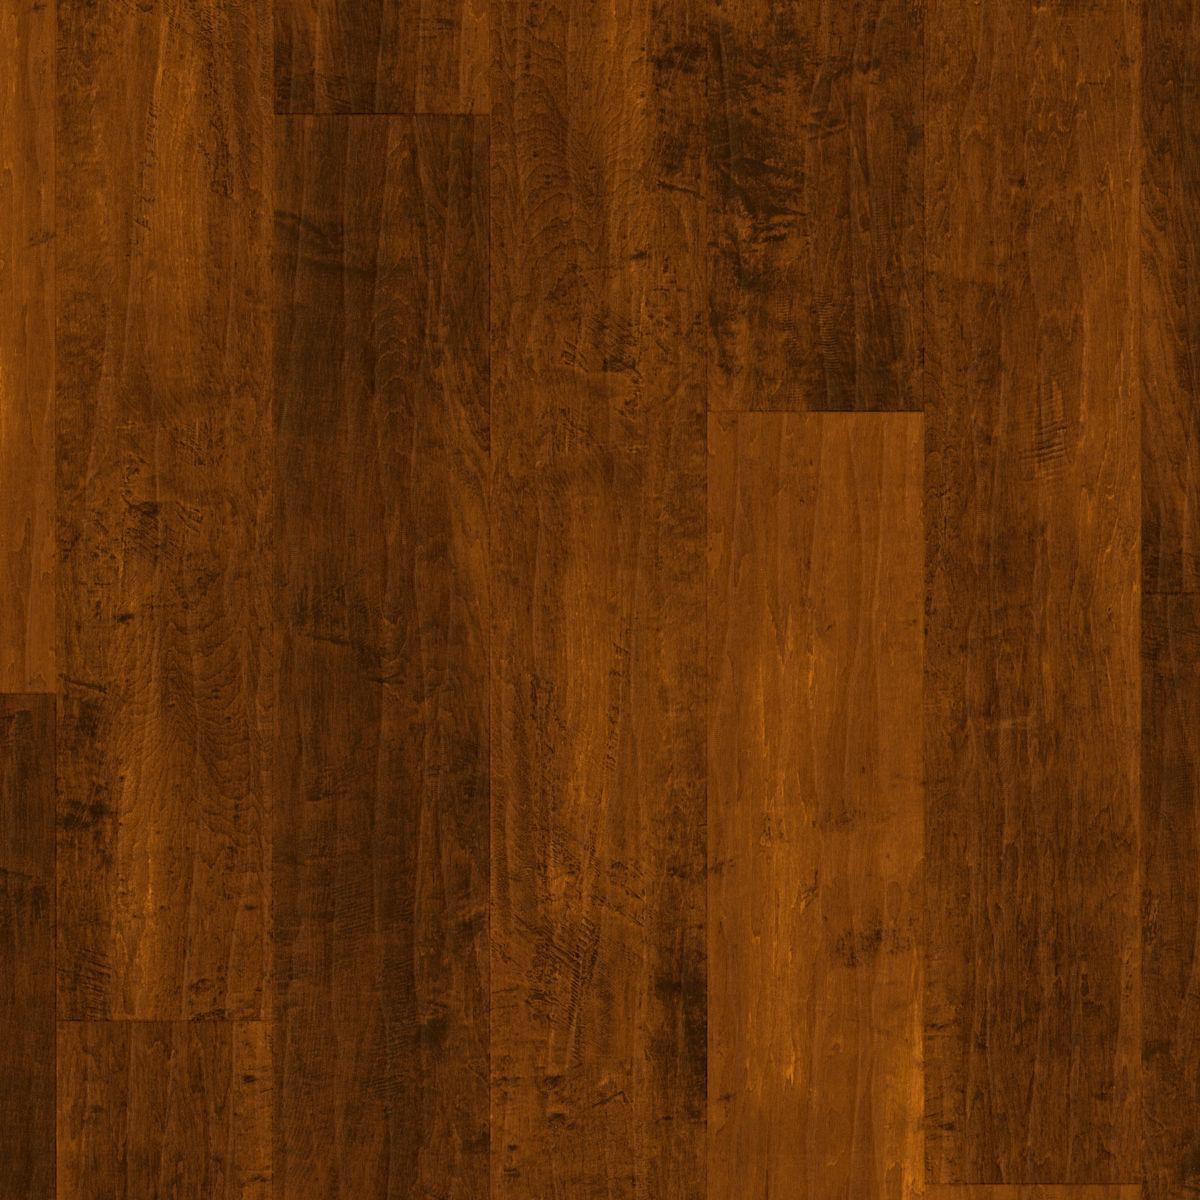 Karndean art select spanish cherry rl05 vinyl flooring for Art select parquet